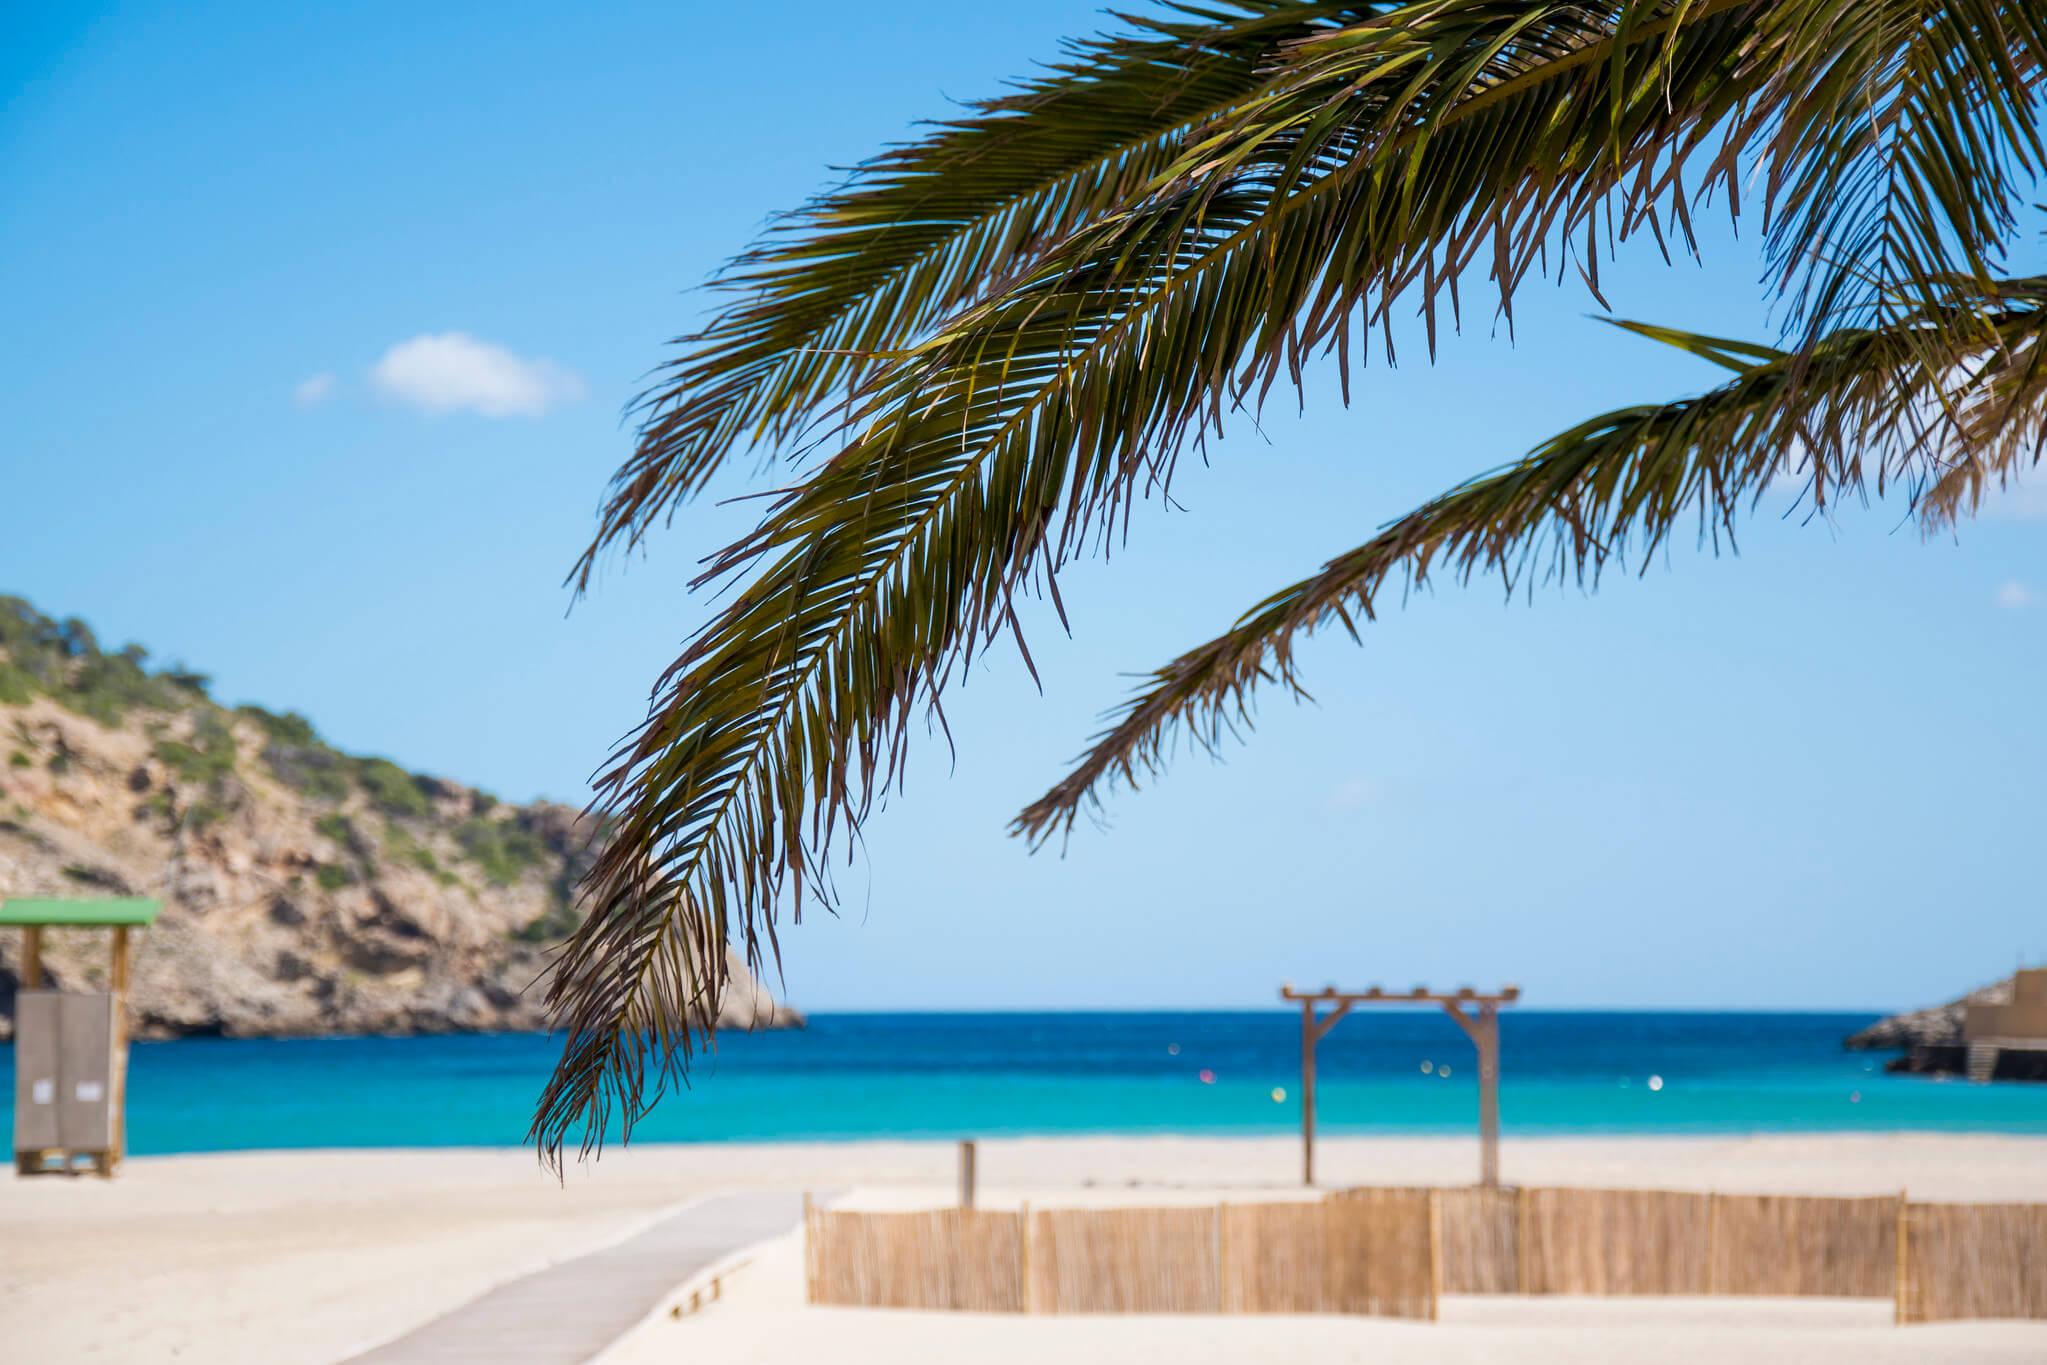 https://www.white-ibiza.com/wp-content/uploads/2020/03/ibiza-beaches-cala-llonga-03.jpg